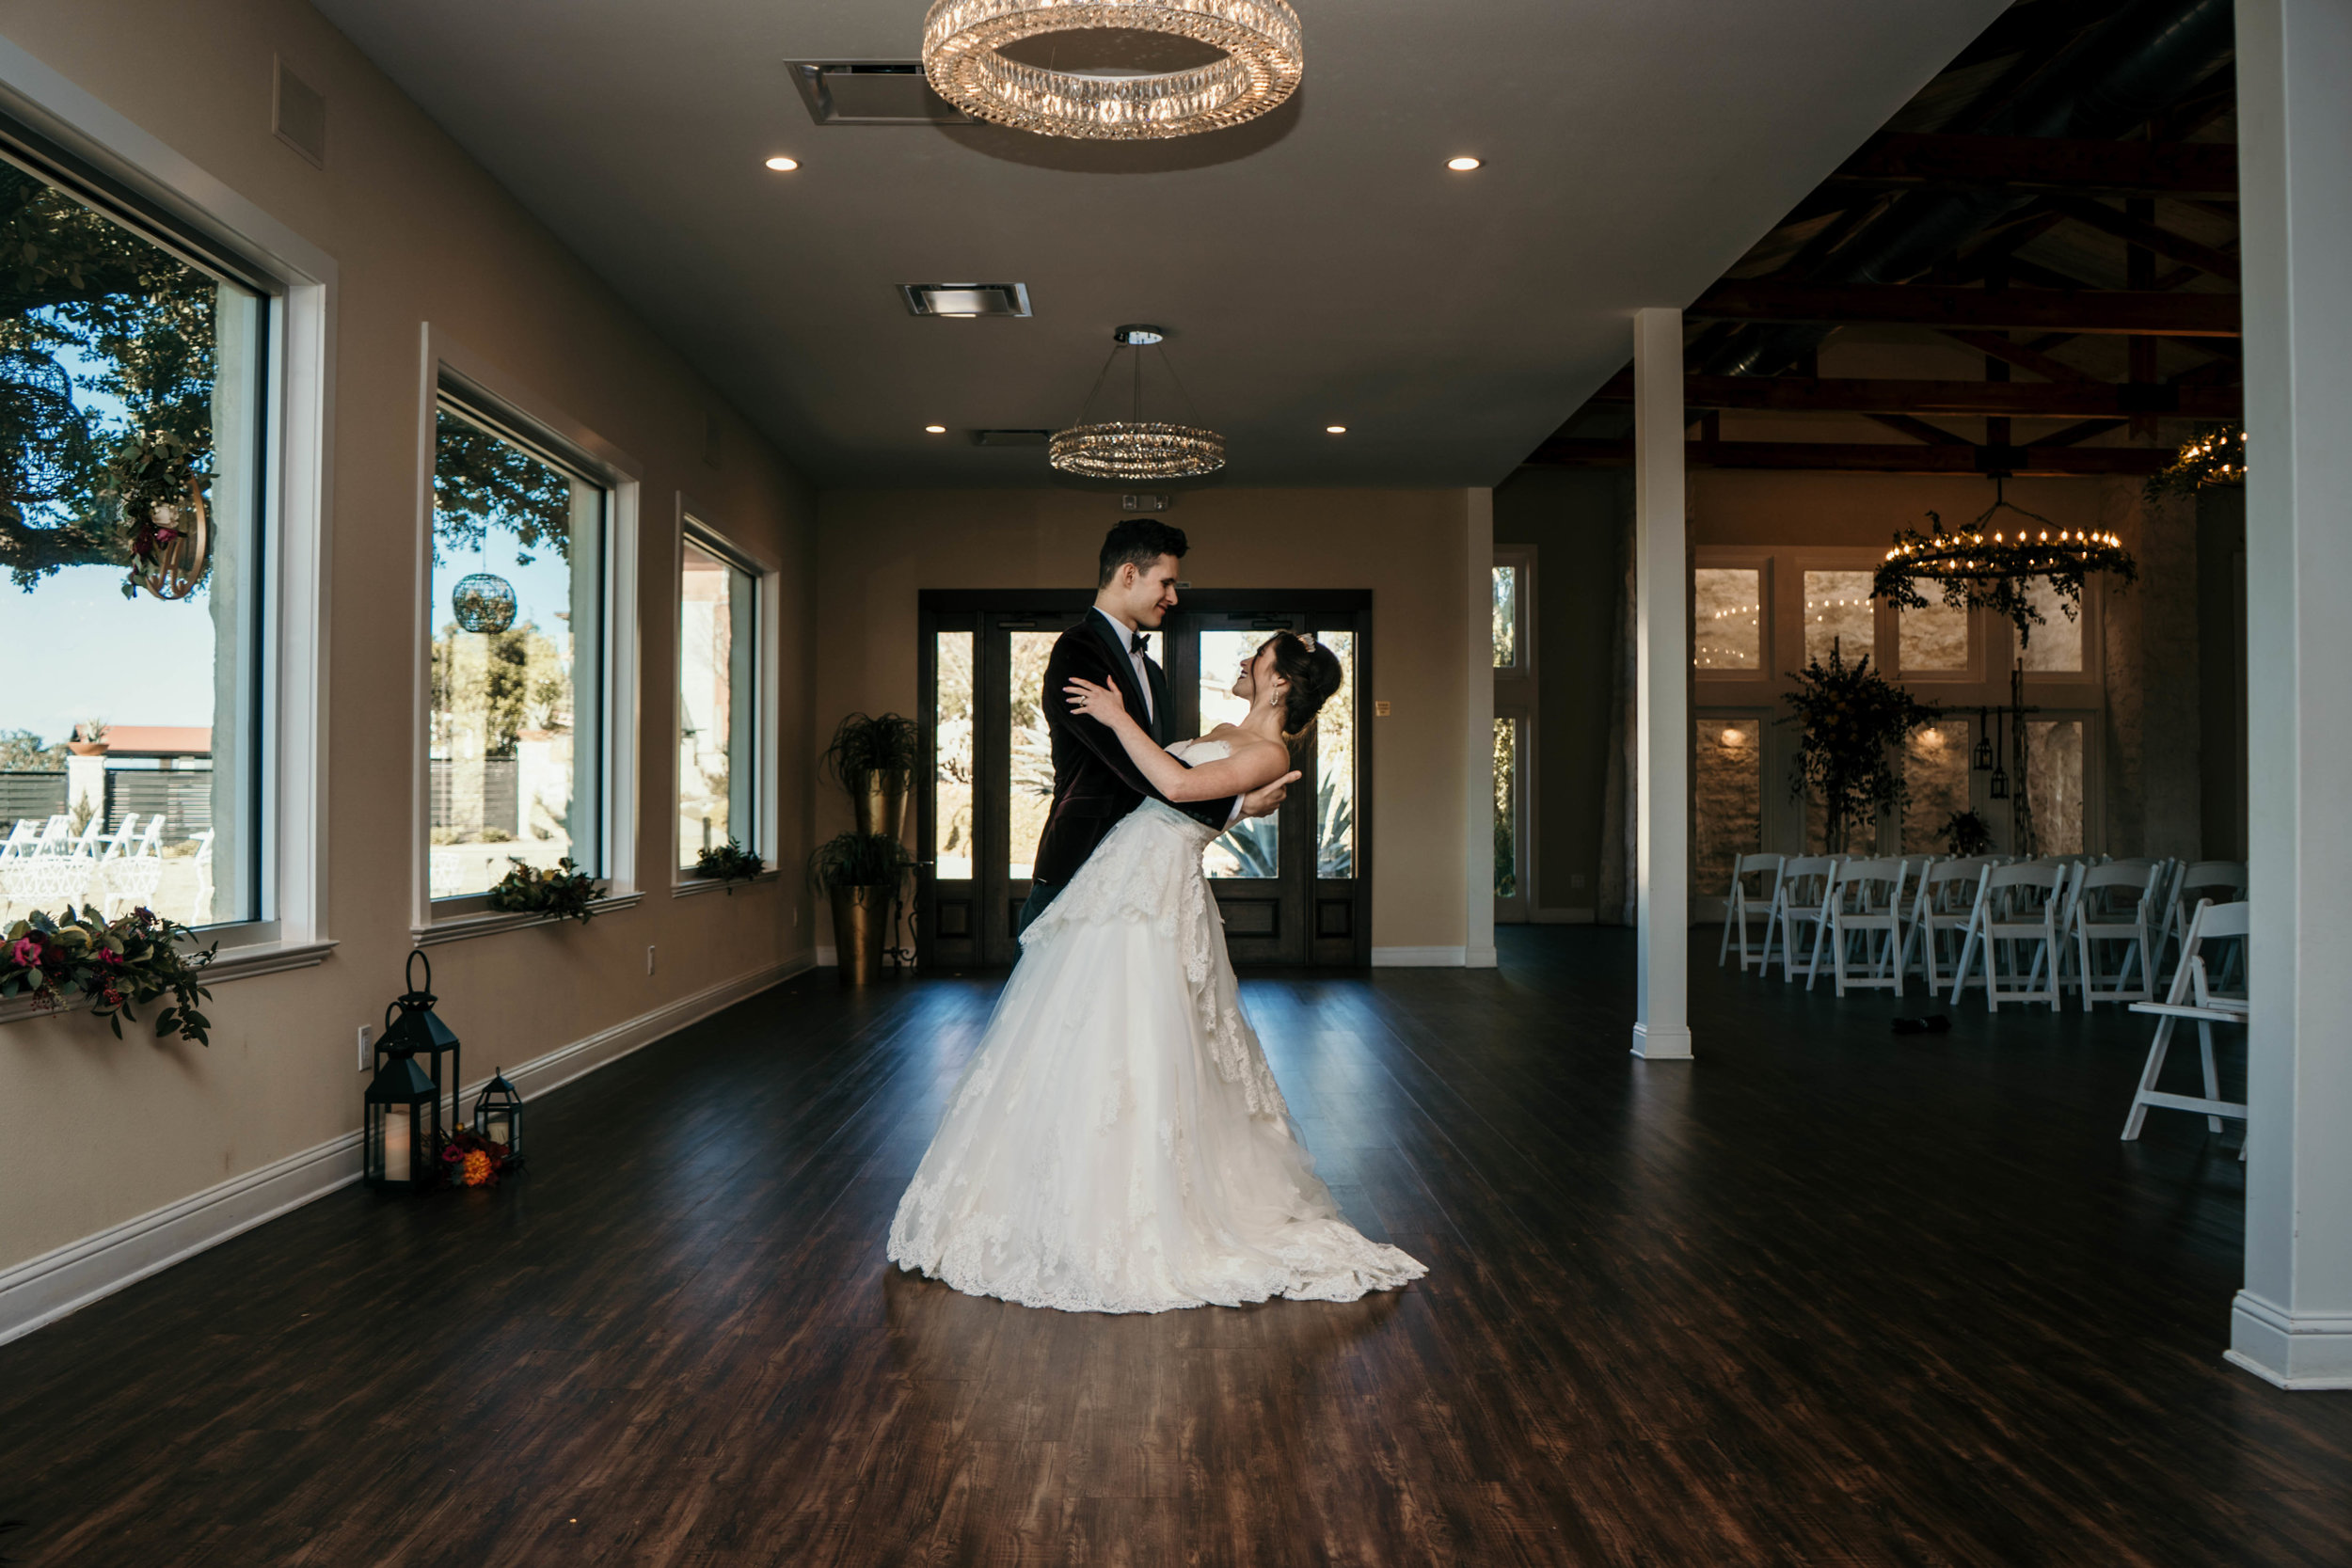 Austin Wedding Videographer - Dolls for Dolls (317 of 323).jpg